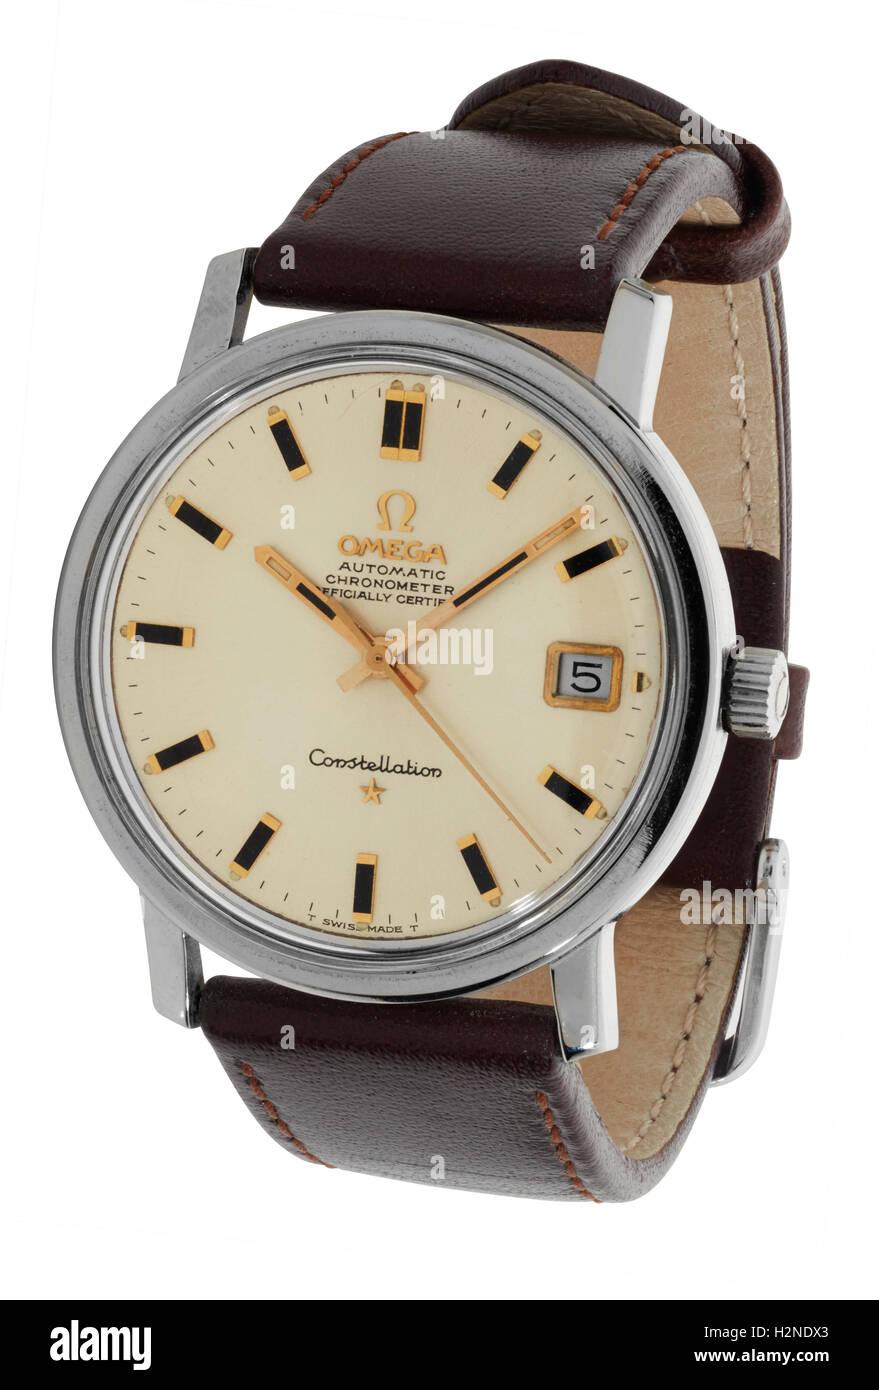 Man's Omega watch - Stock Image